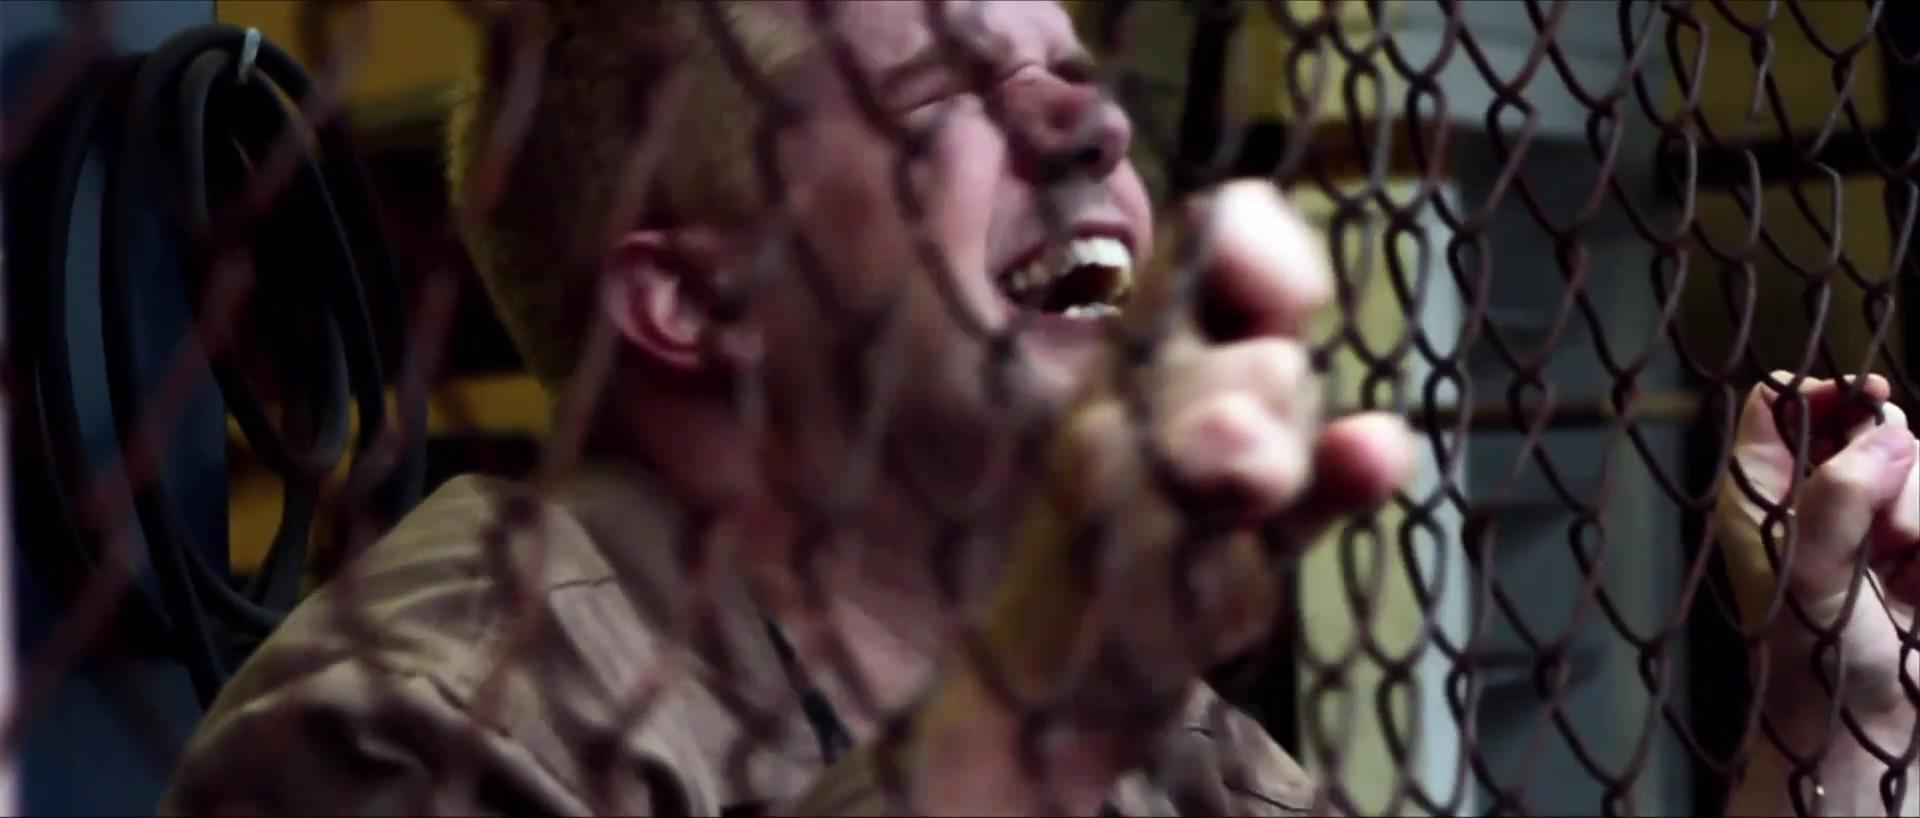 rfmt-134-moose-grips-fence